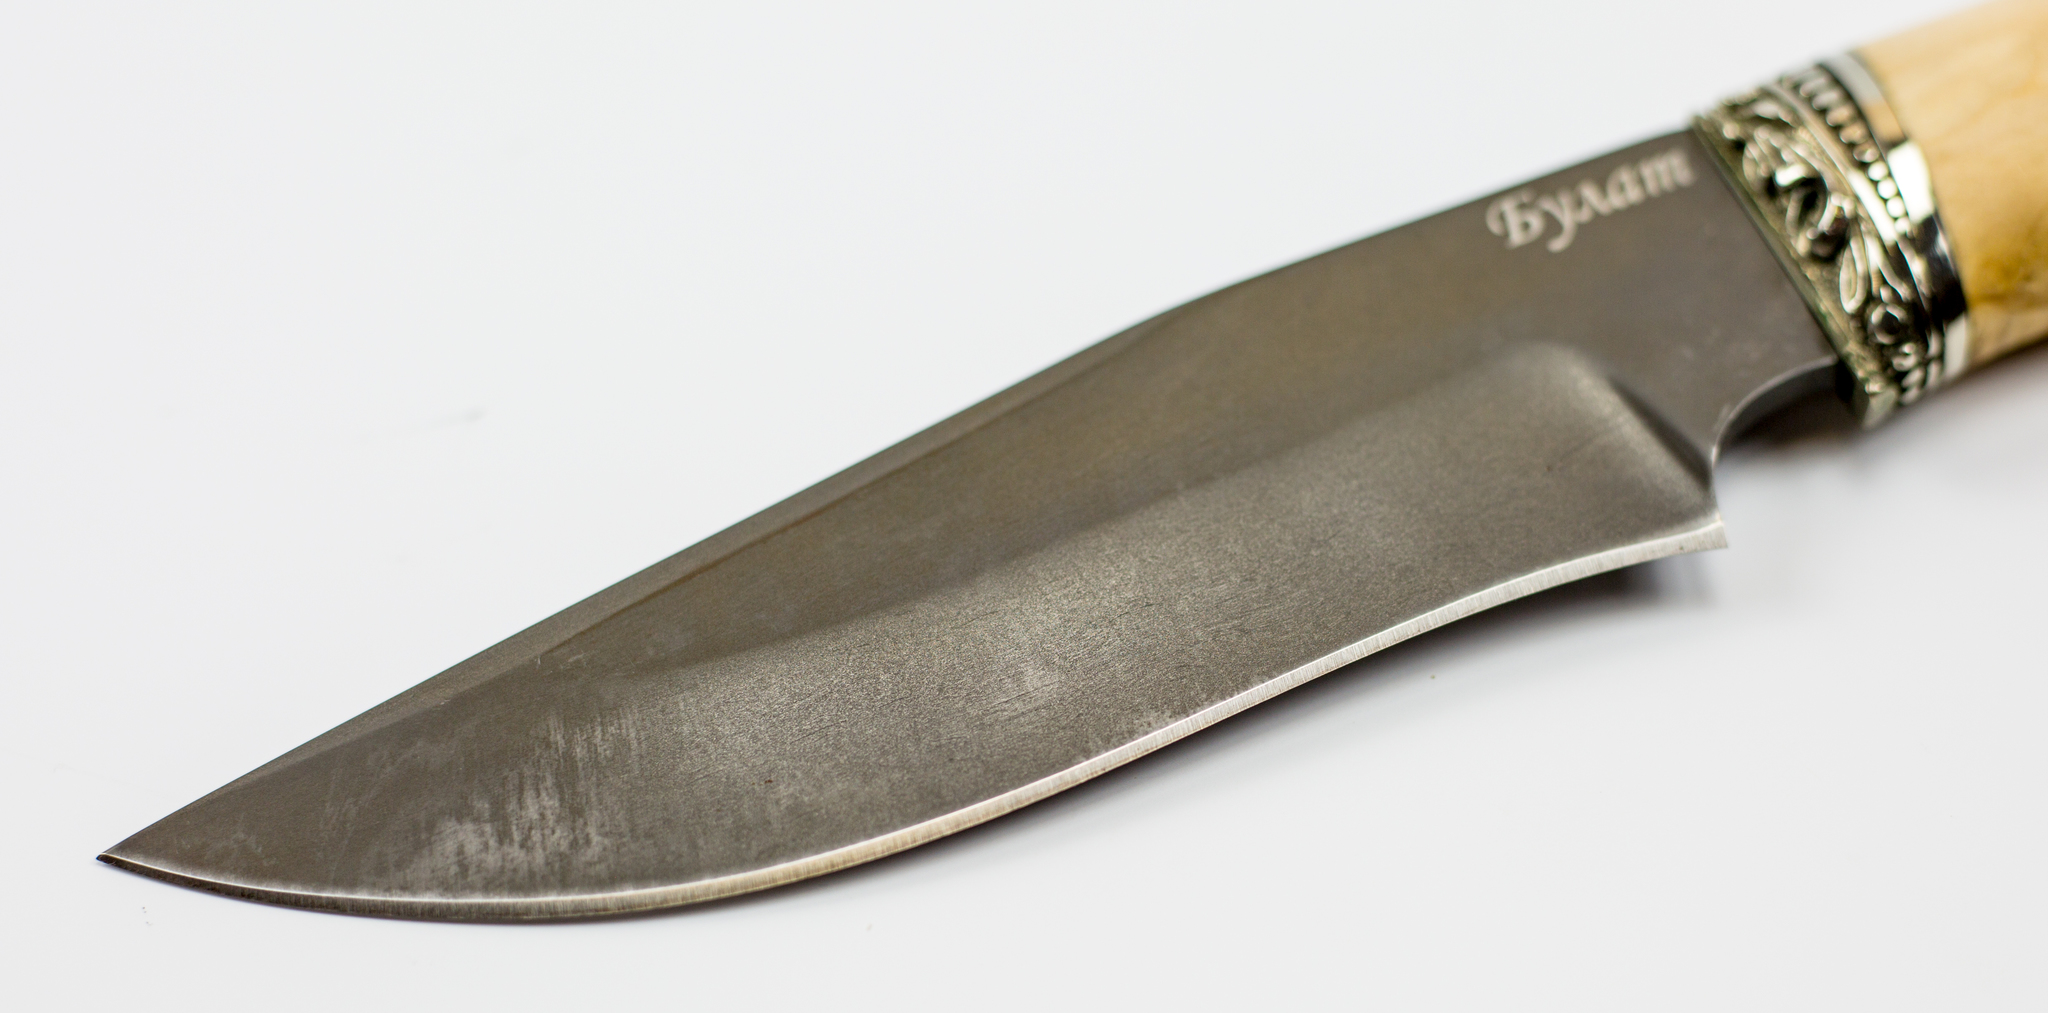 Фото 11 - Нож